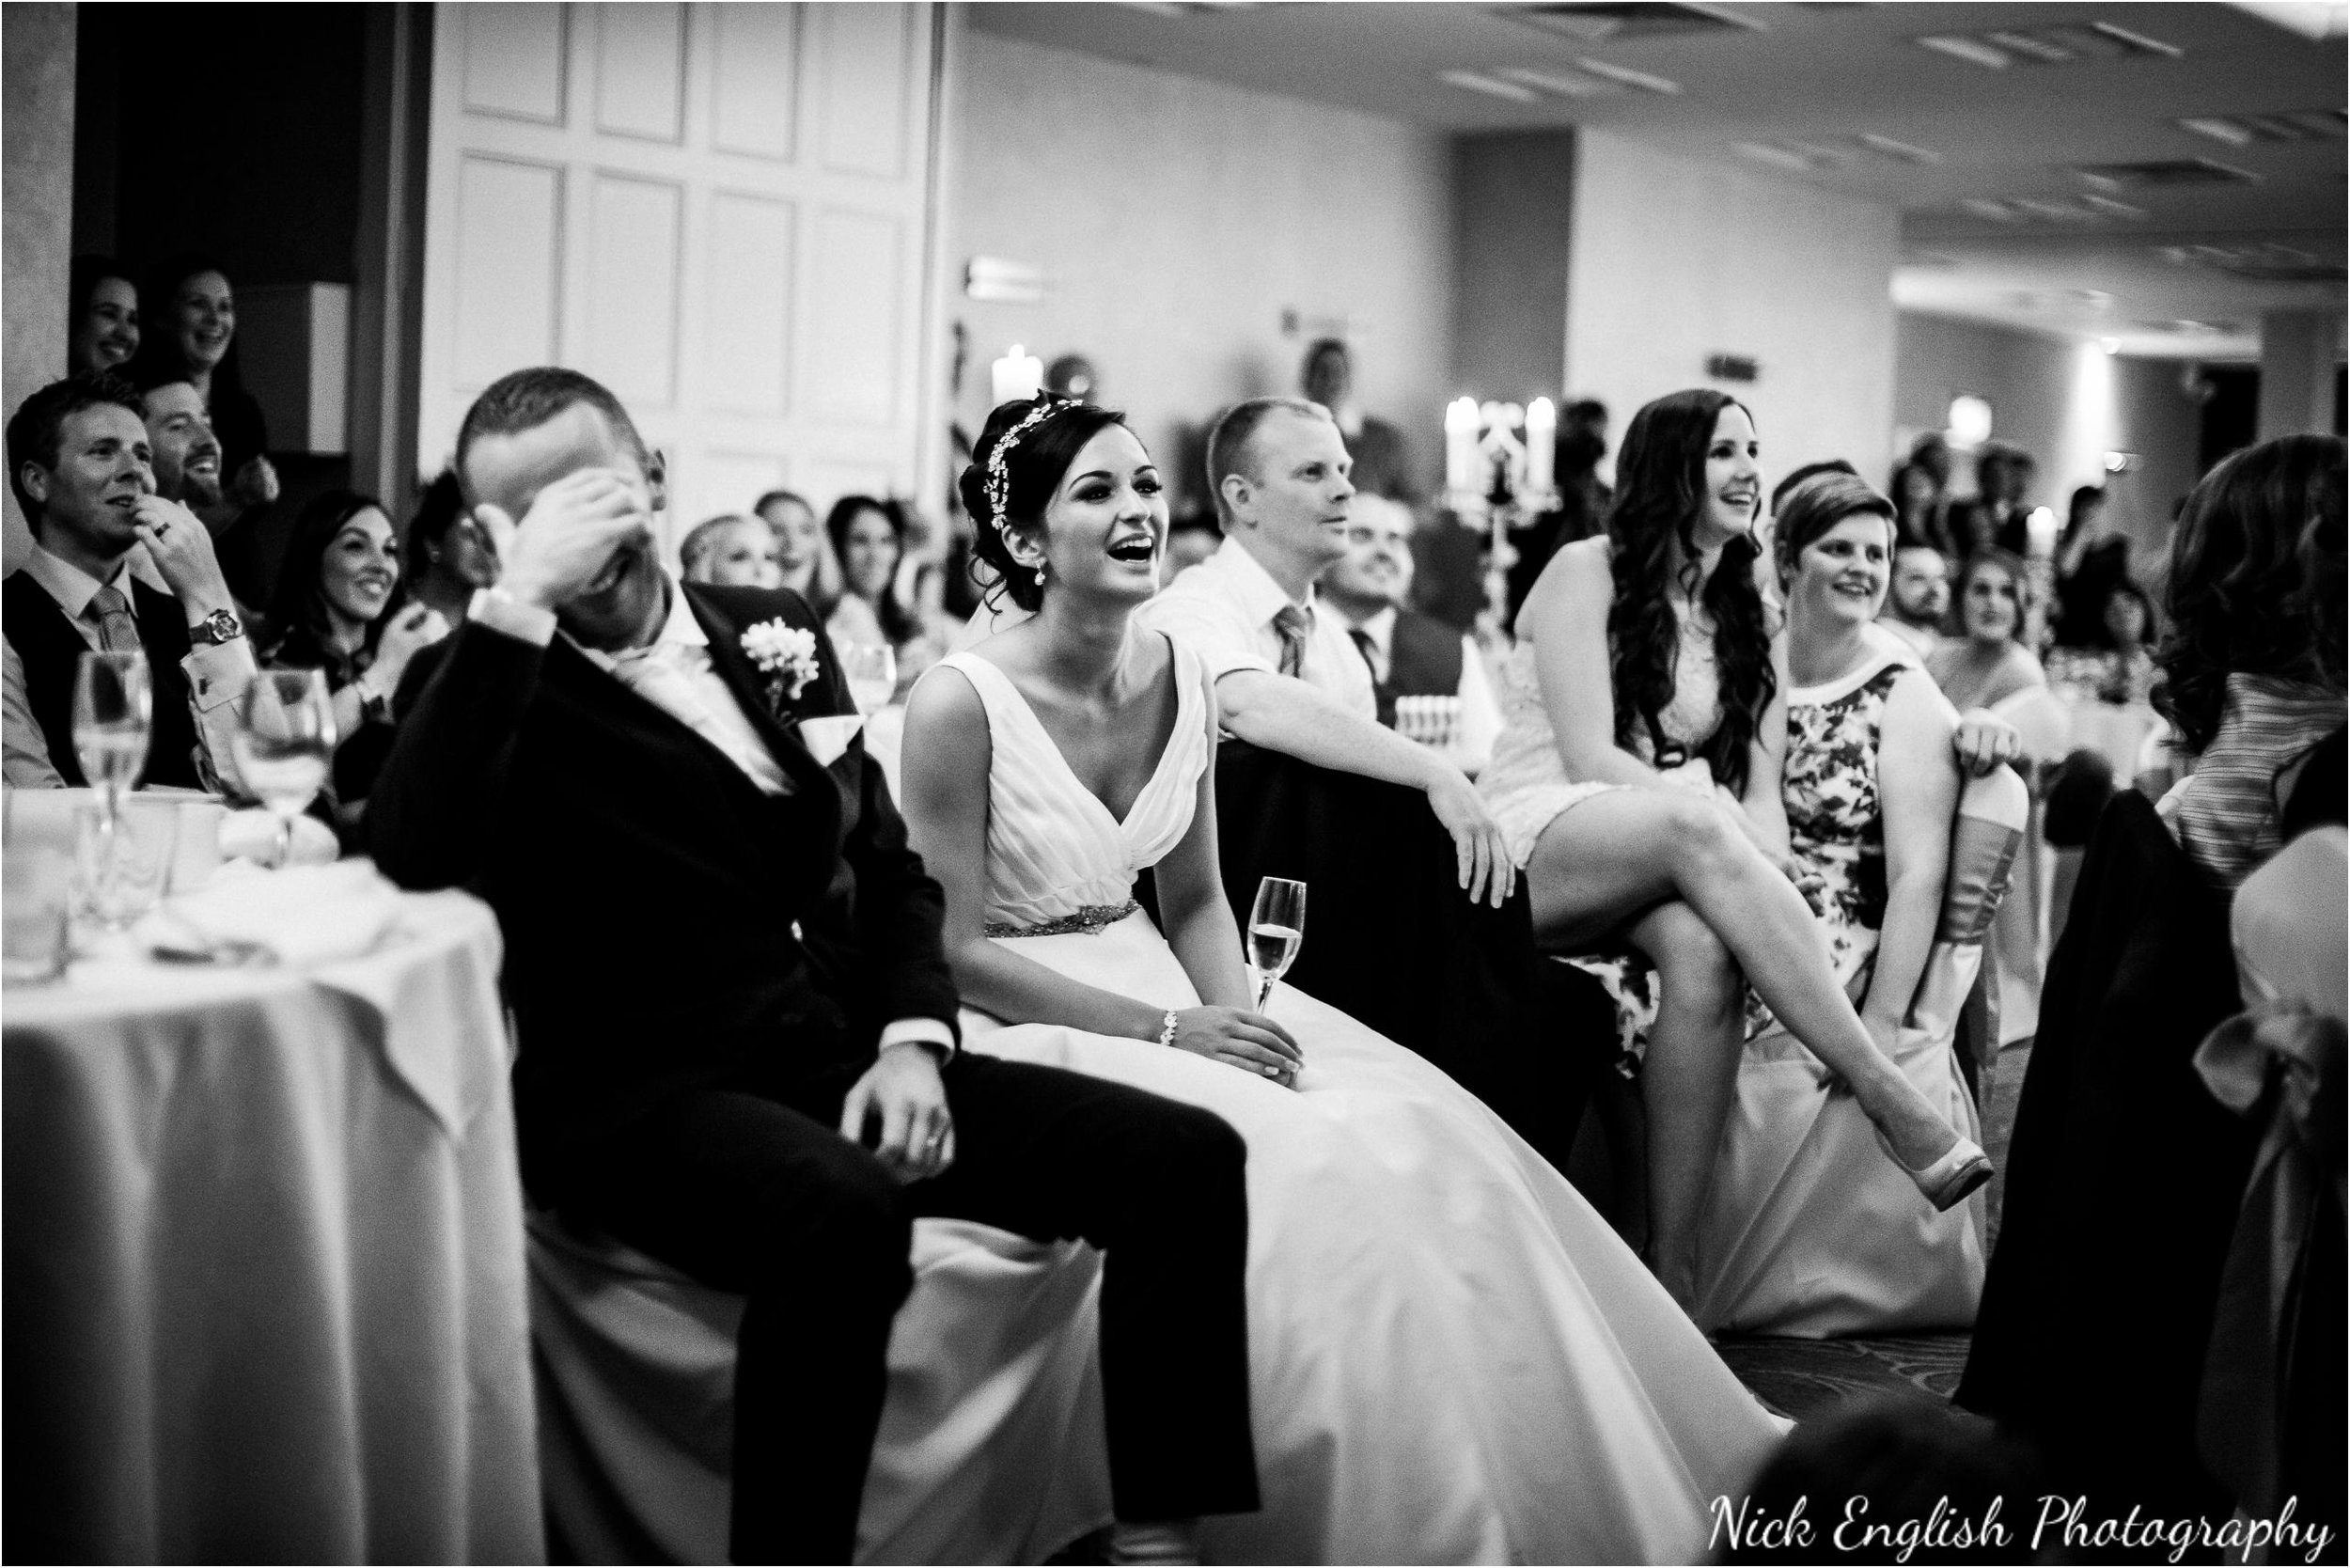 Emily David Wedding Photographs at Barton Grange Preston by Nick English Photography 185jpg.jpeg